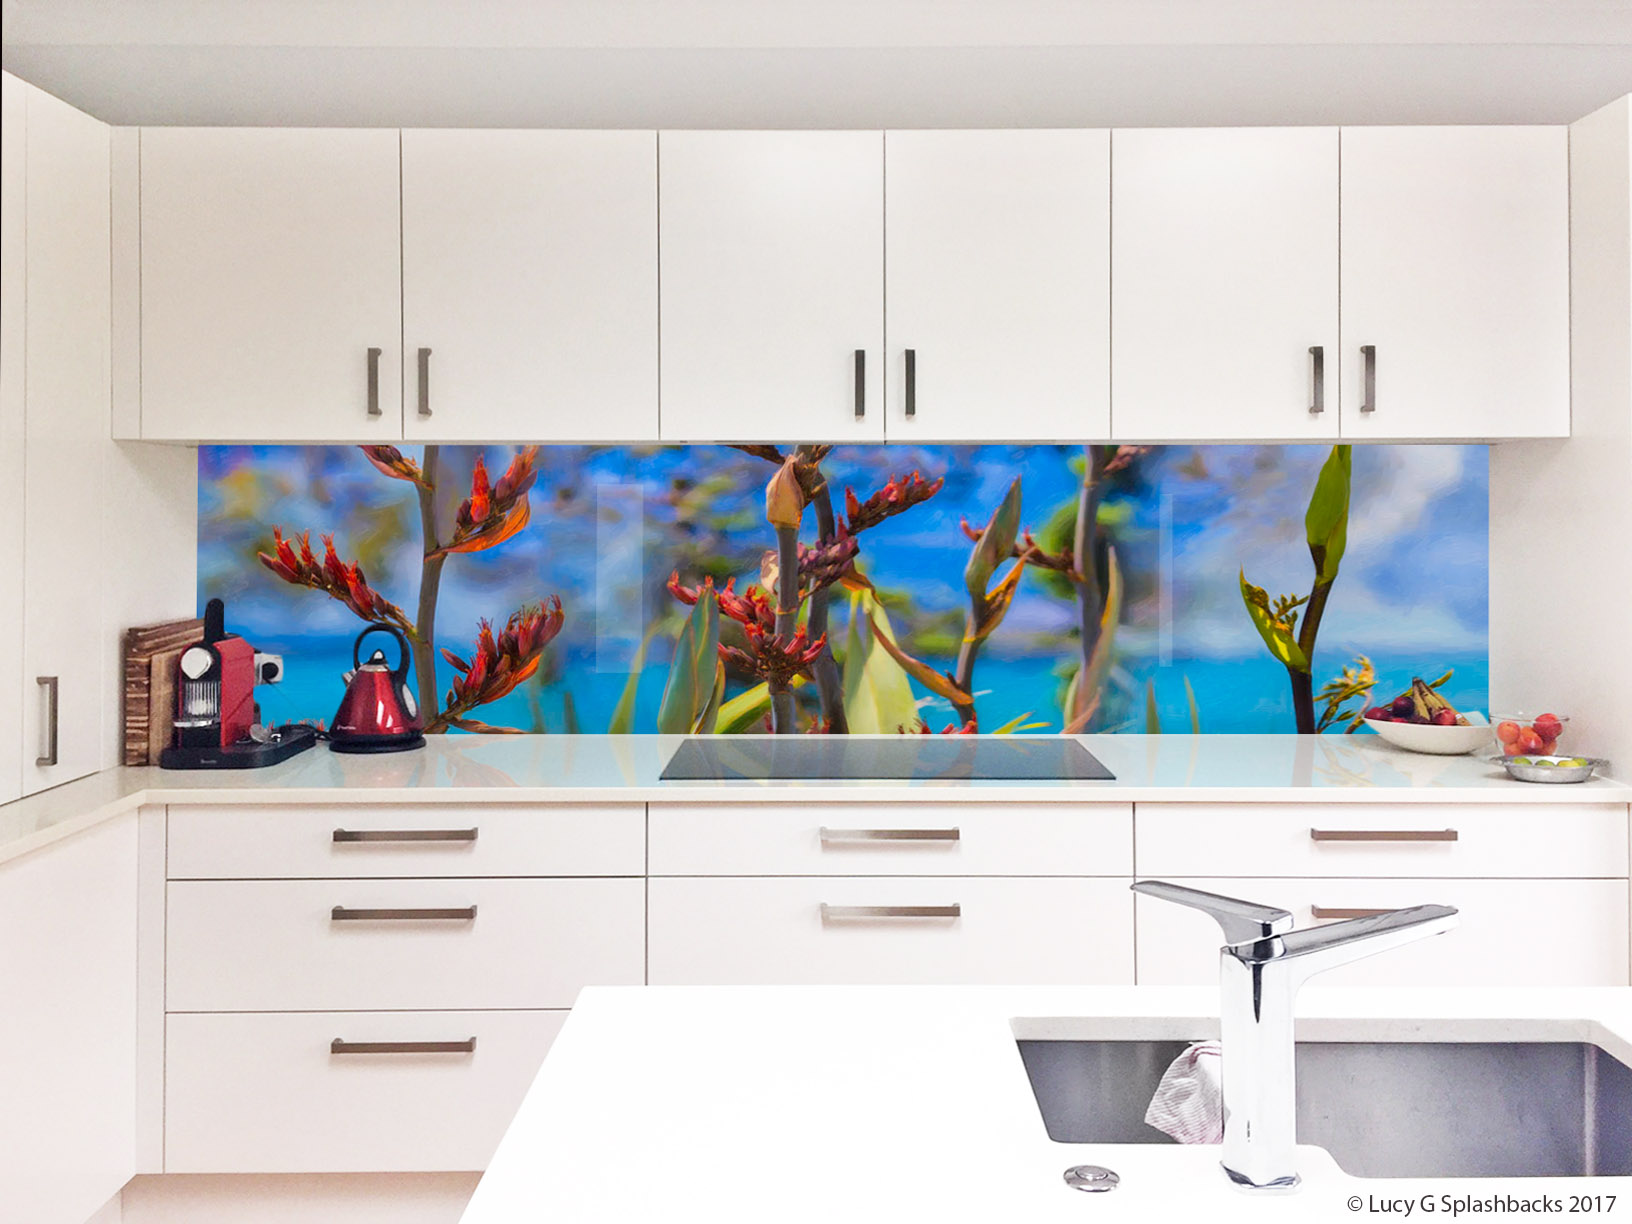 Flax Buds  lucy g printed image on glass splashbacks